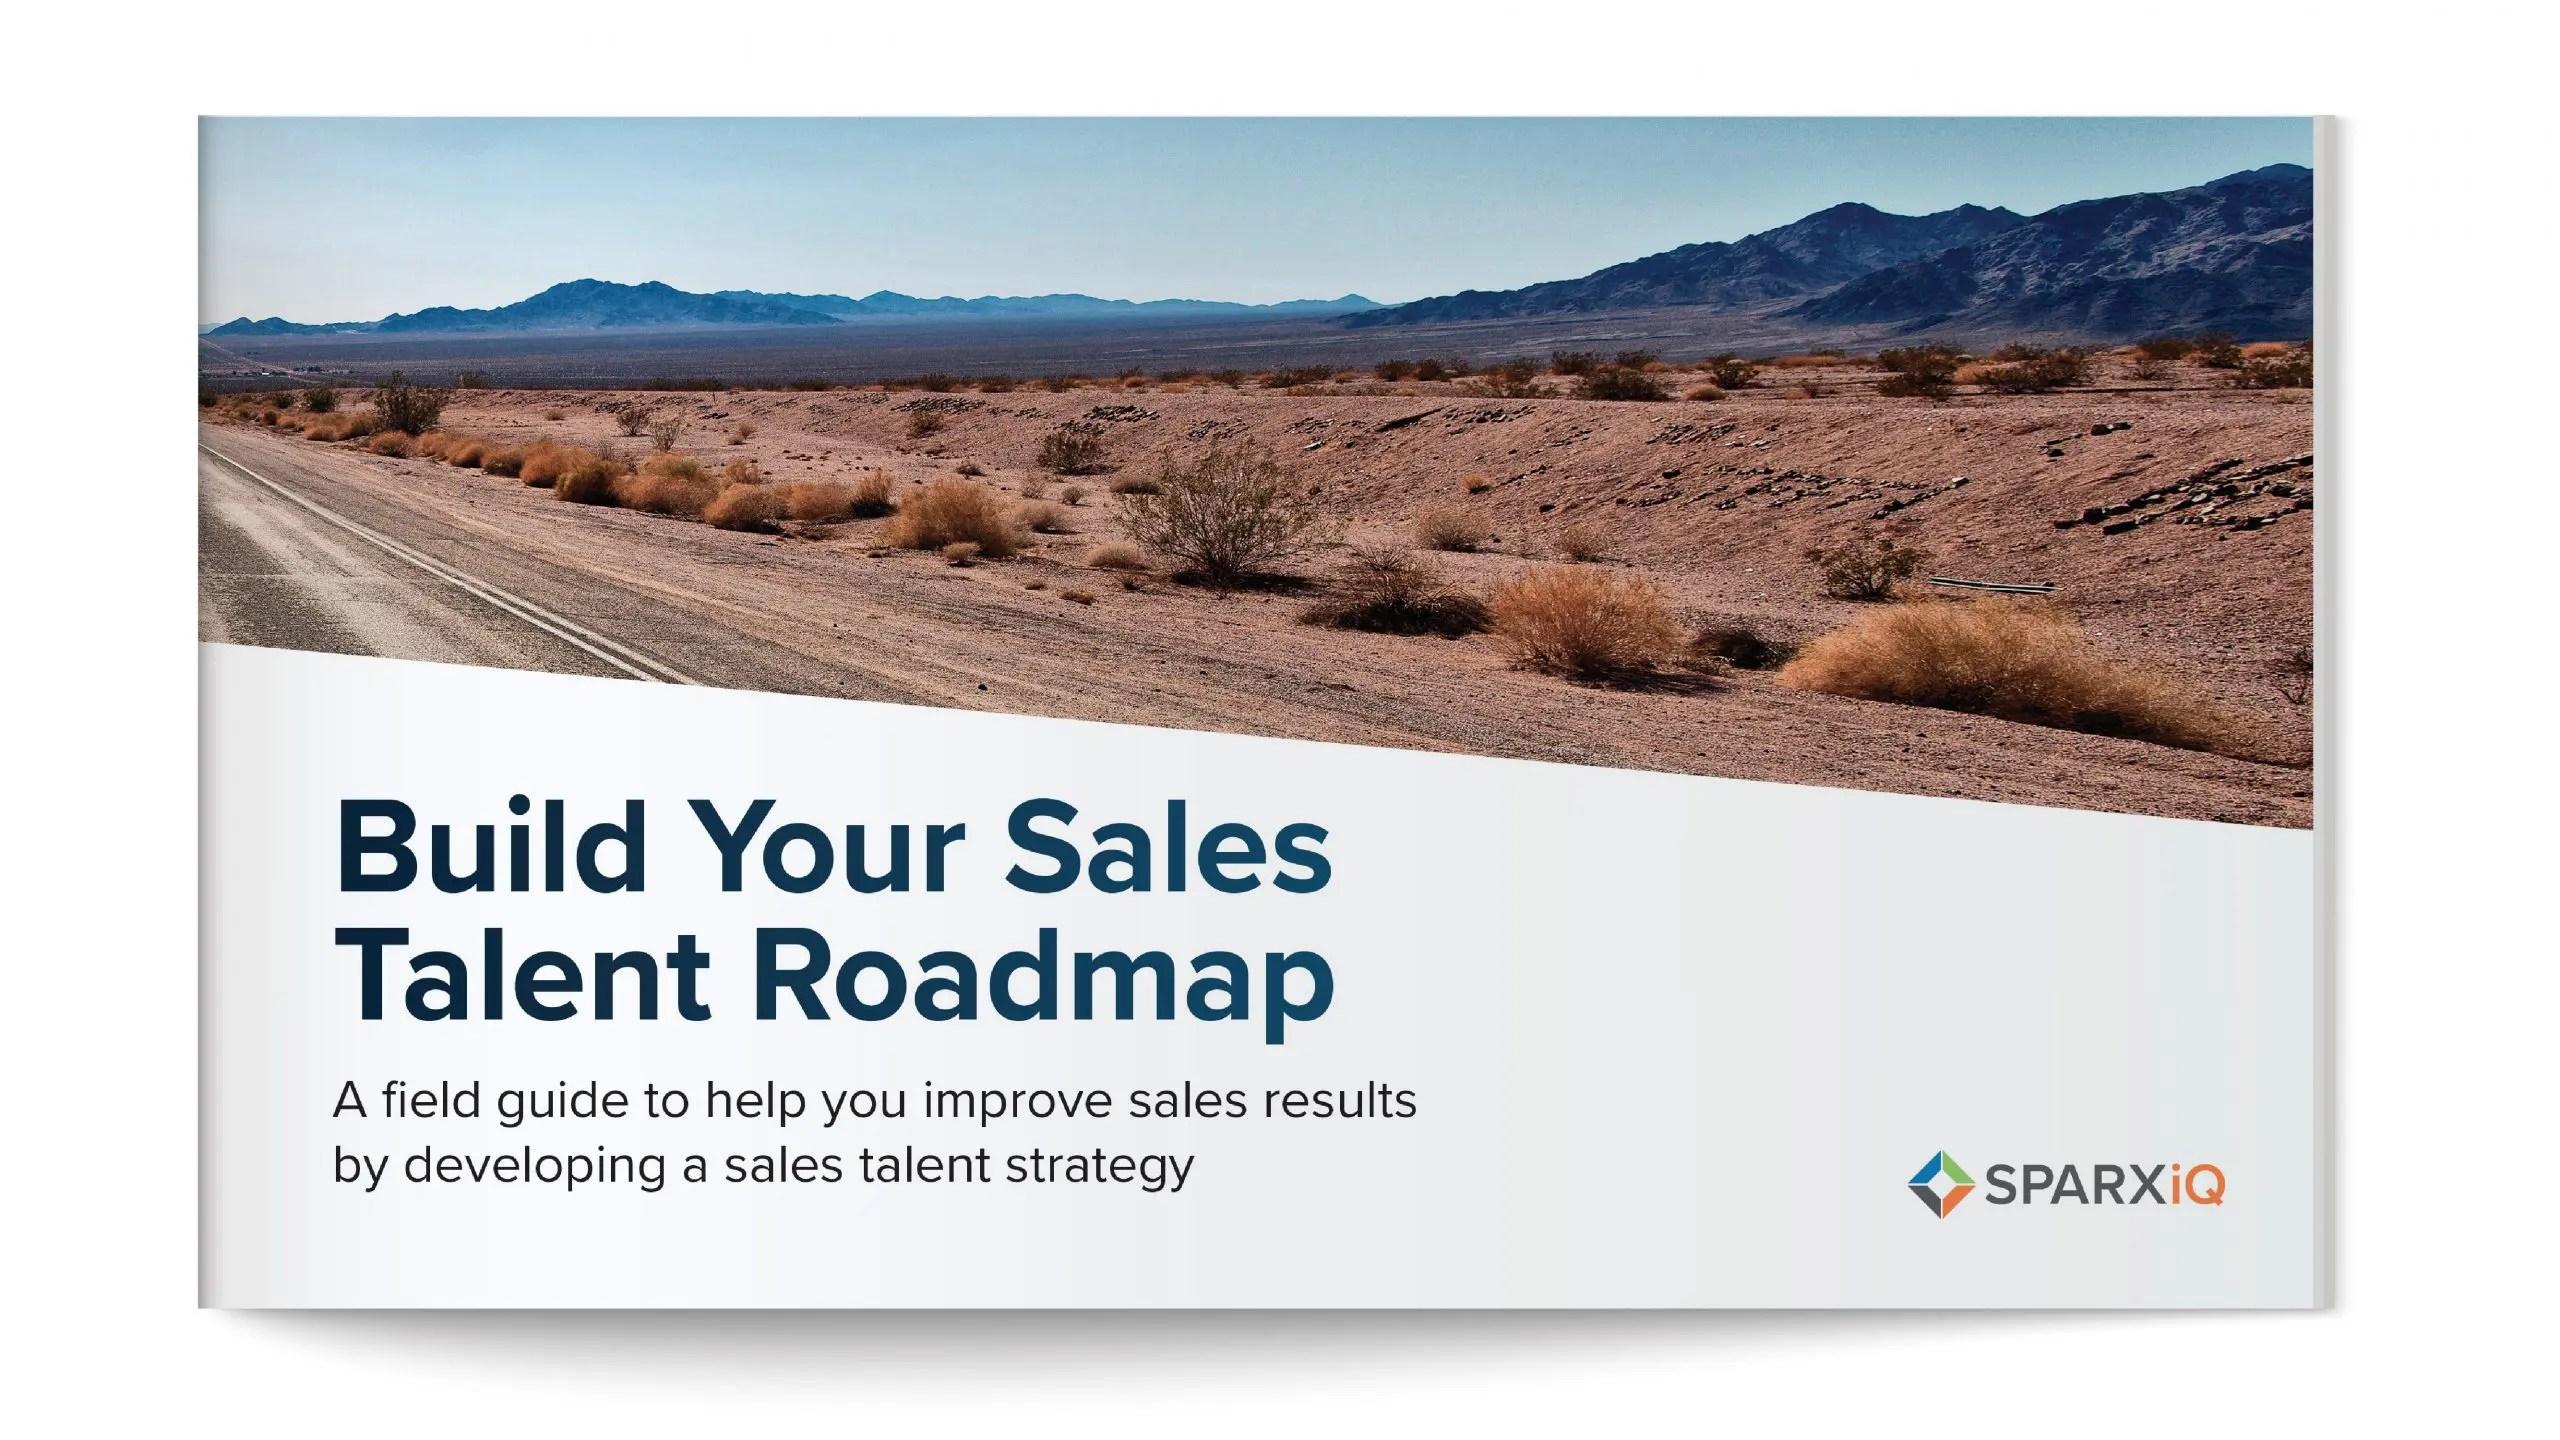 SPARXiQ Sales Talent Roadmap field guide